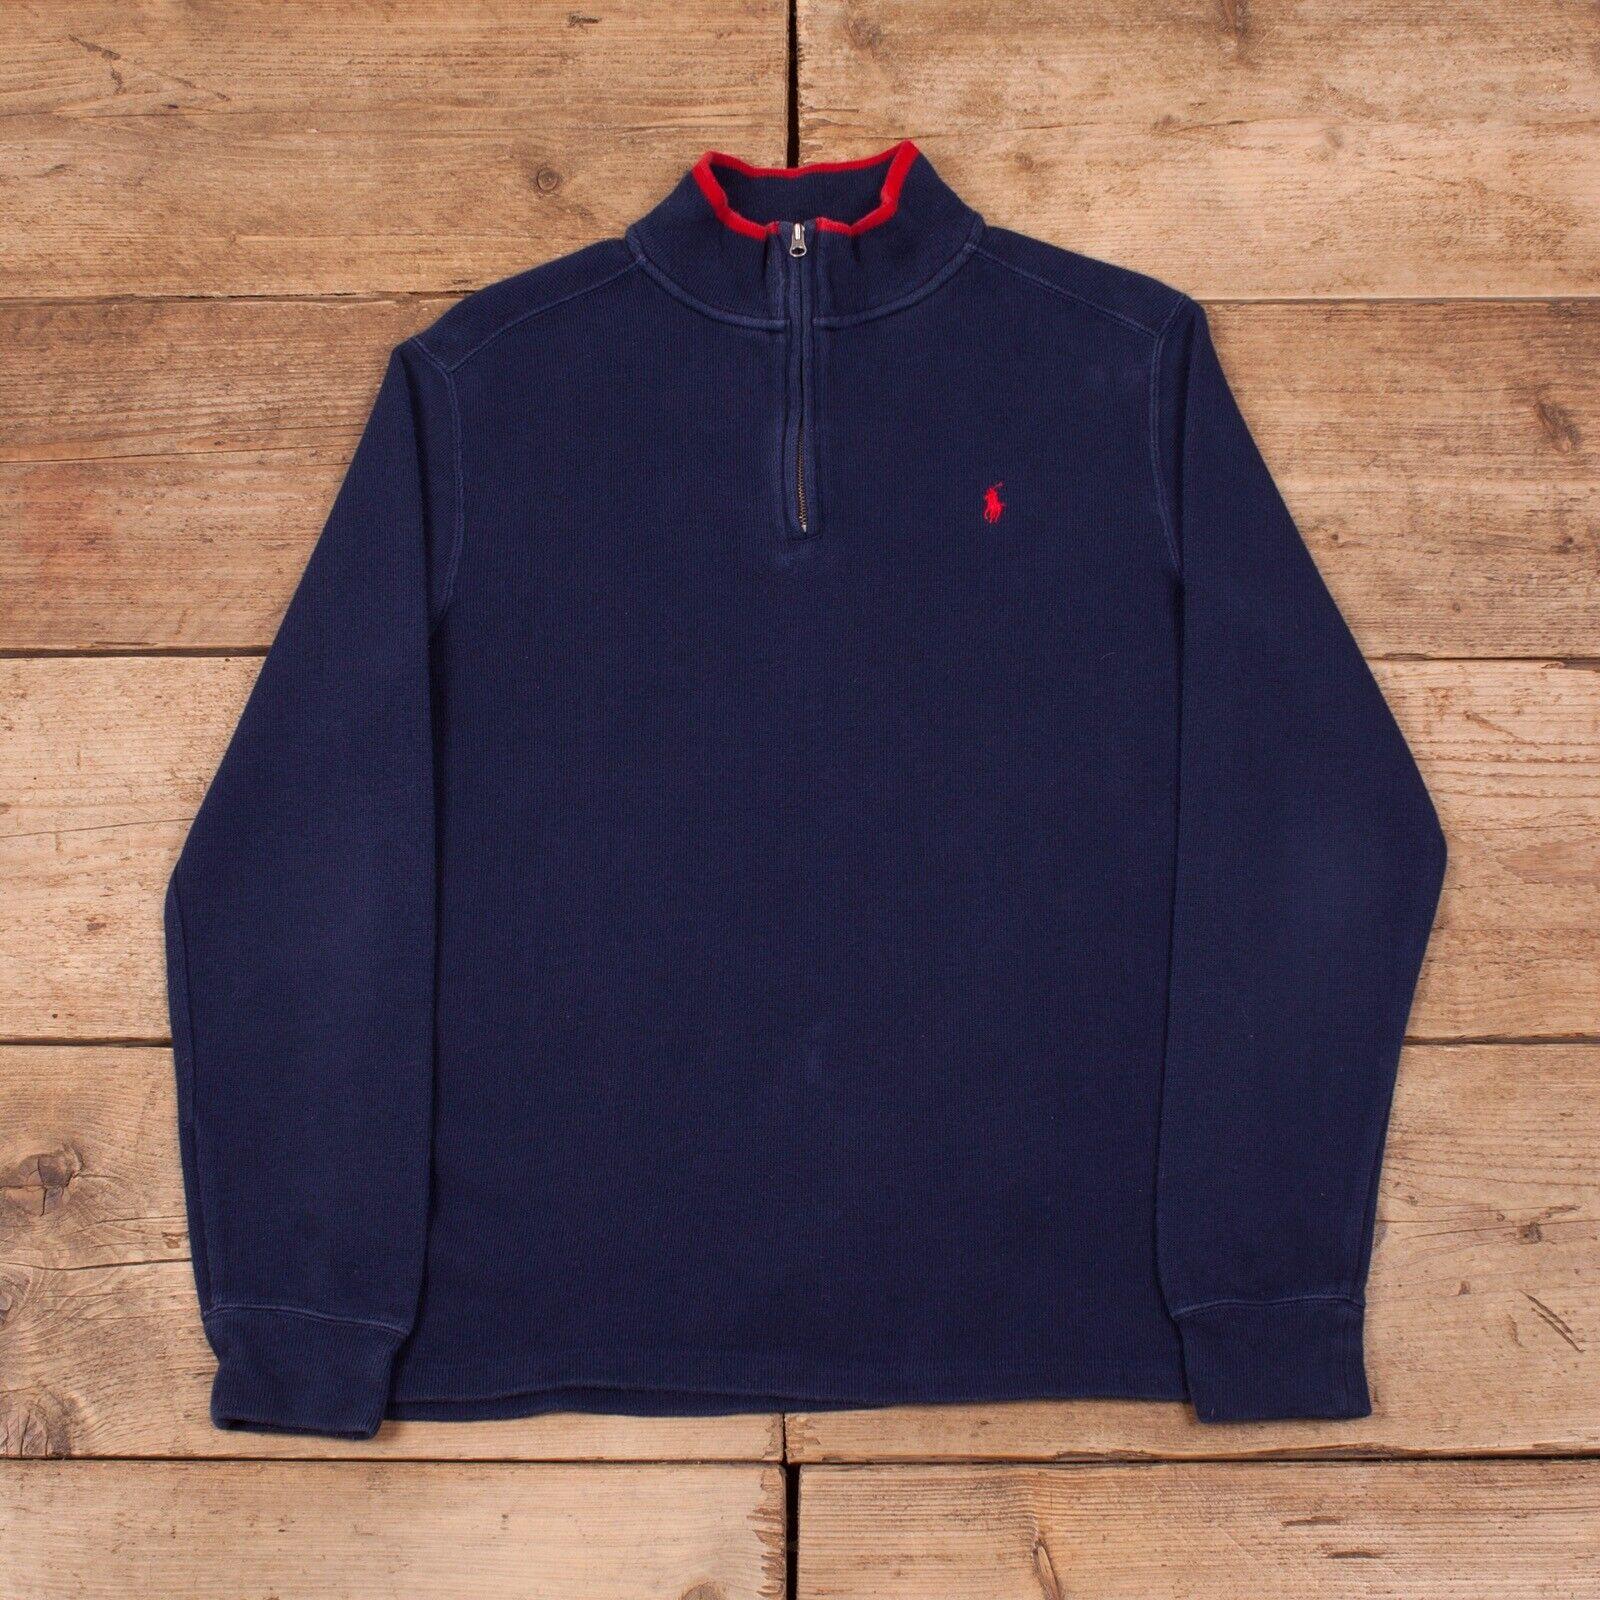 Womens Vintage Polo Ralph Lauren bluee Half Zip Jumper Sweatshirt Large 14 R11692